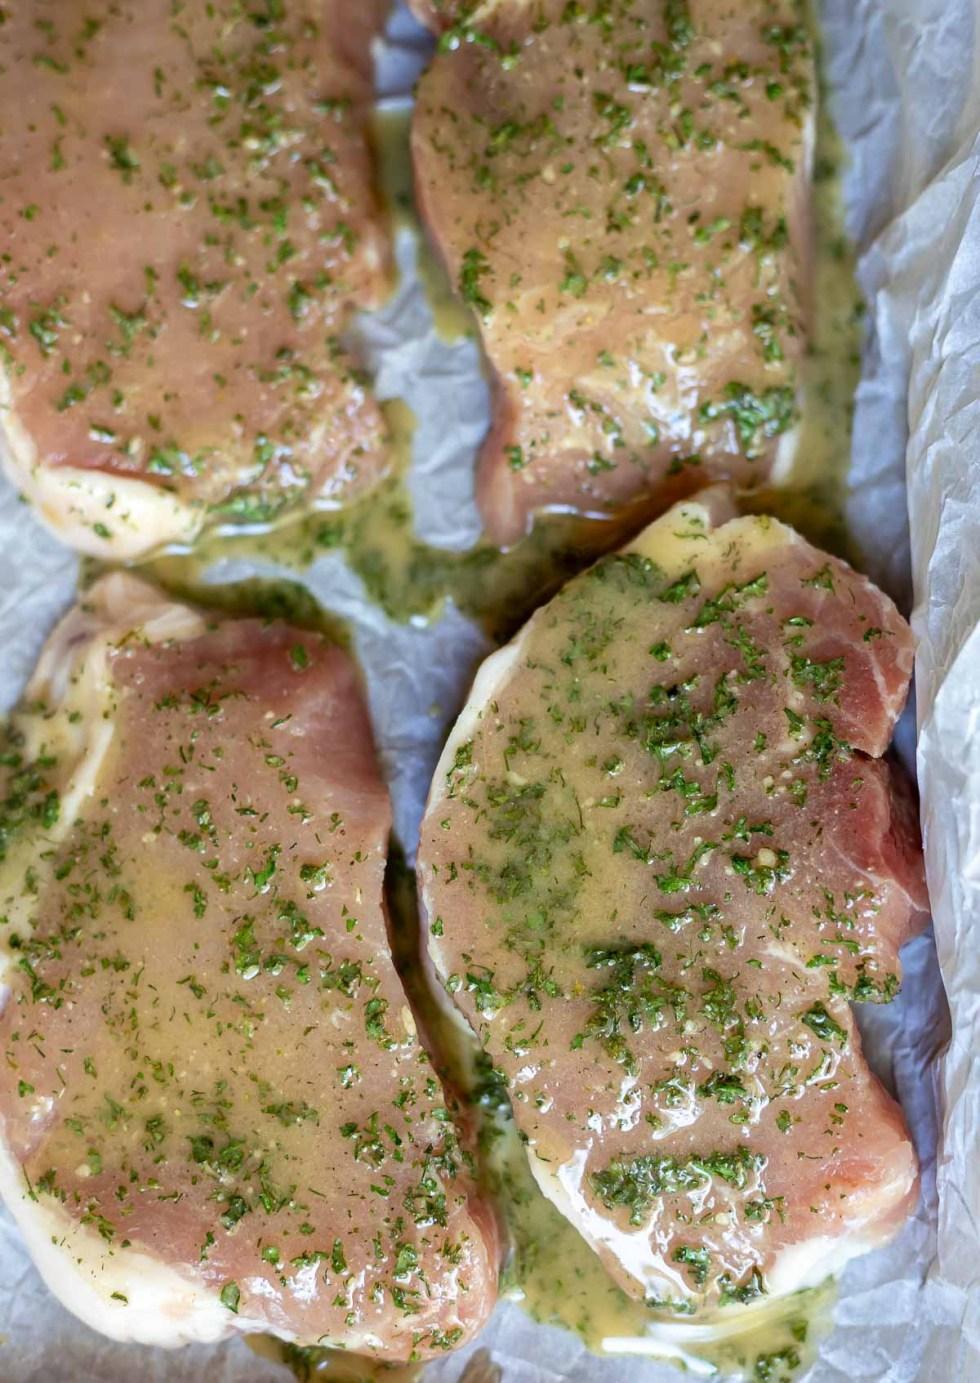 raw pork chops coated with seasoning